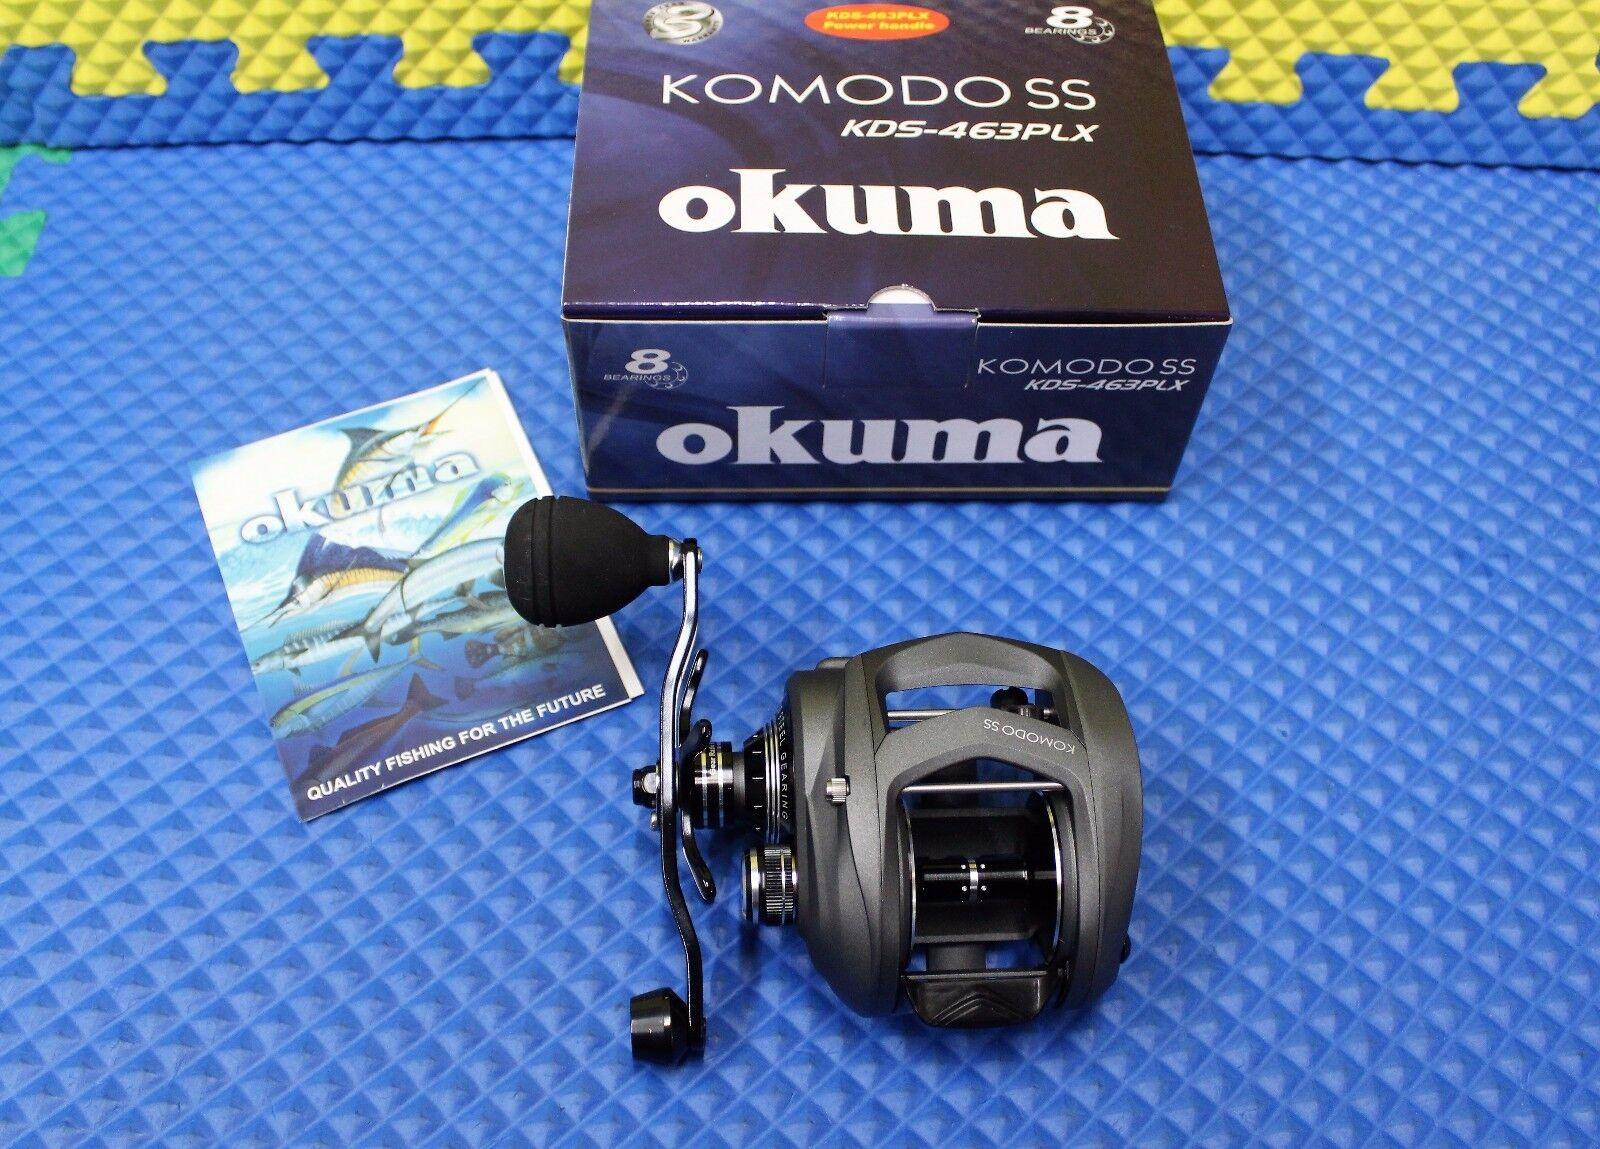 Okuma Komodo SS LeftHanded Low Profile Baitcast Reel wPower Handle KDS463PLX